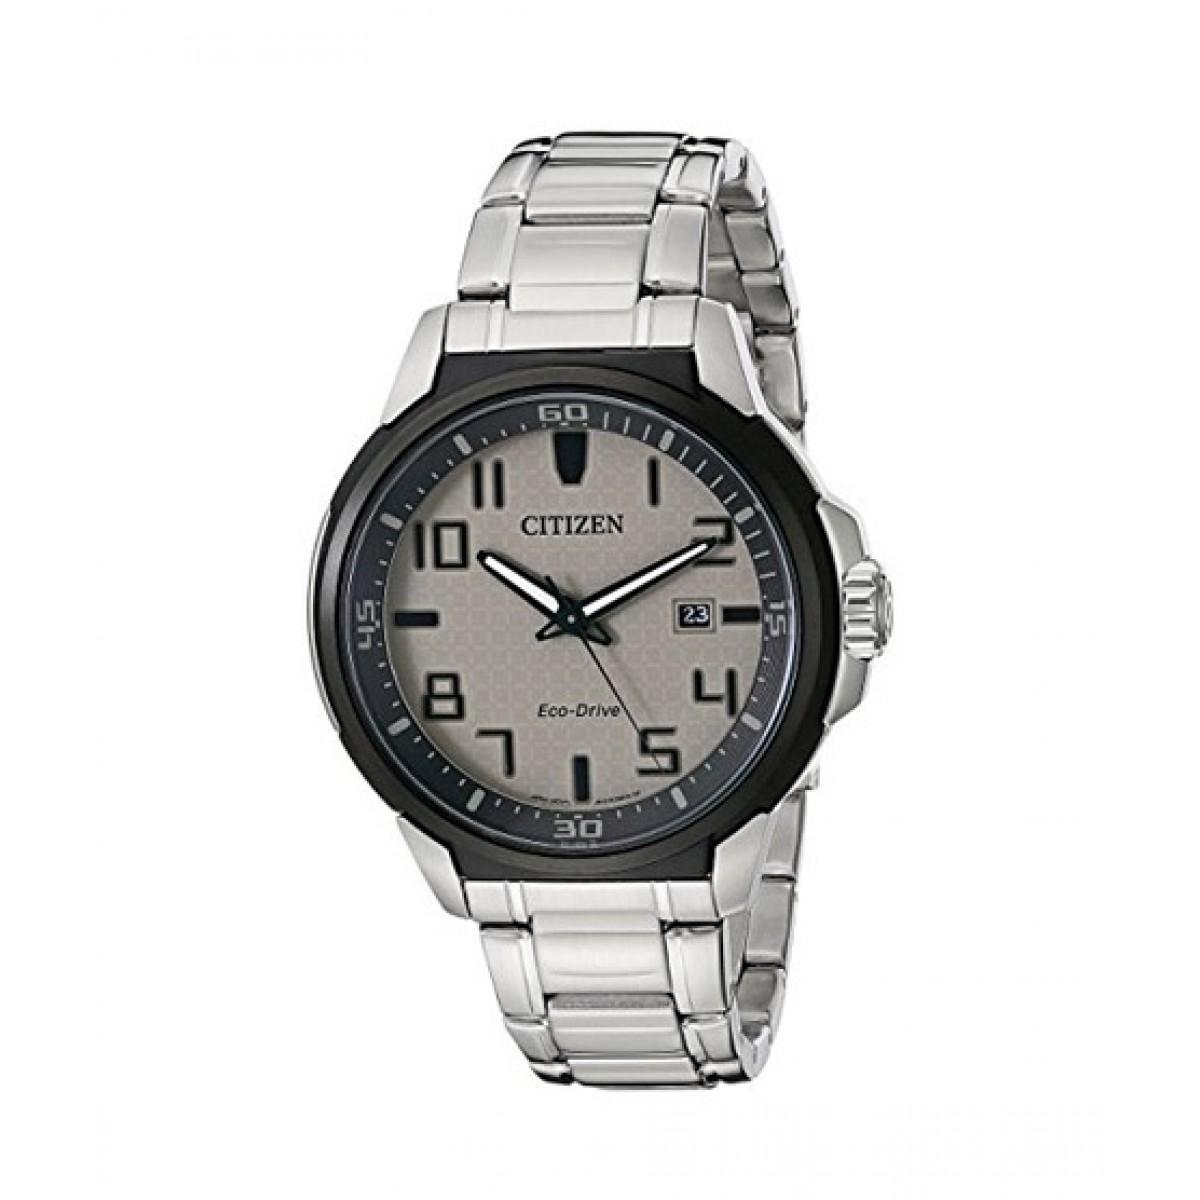 Citizen Eco-Drive Men's Watch Silver (AW1461-58H)